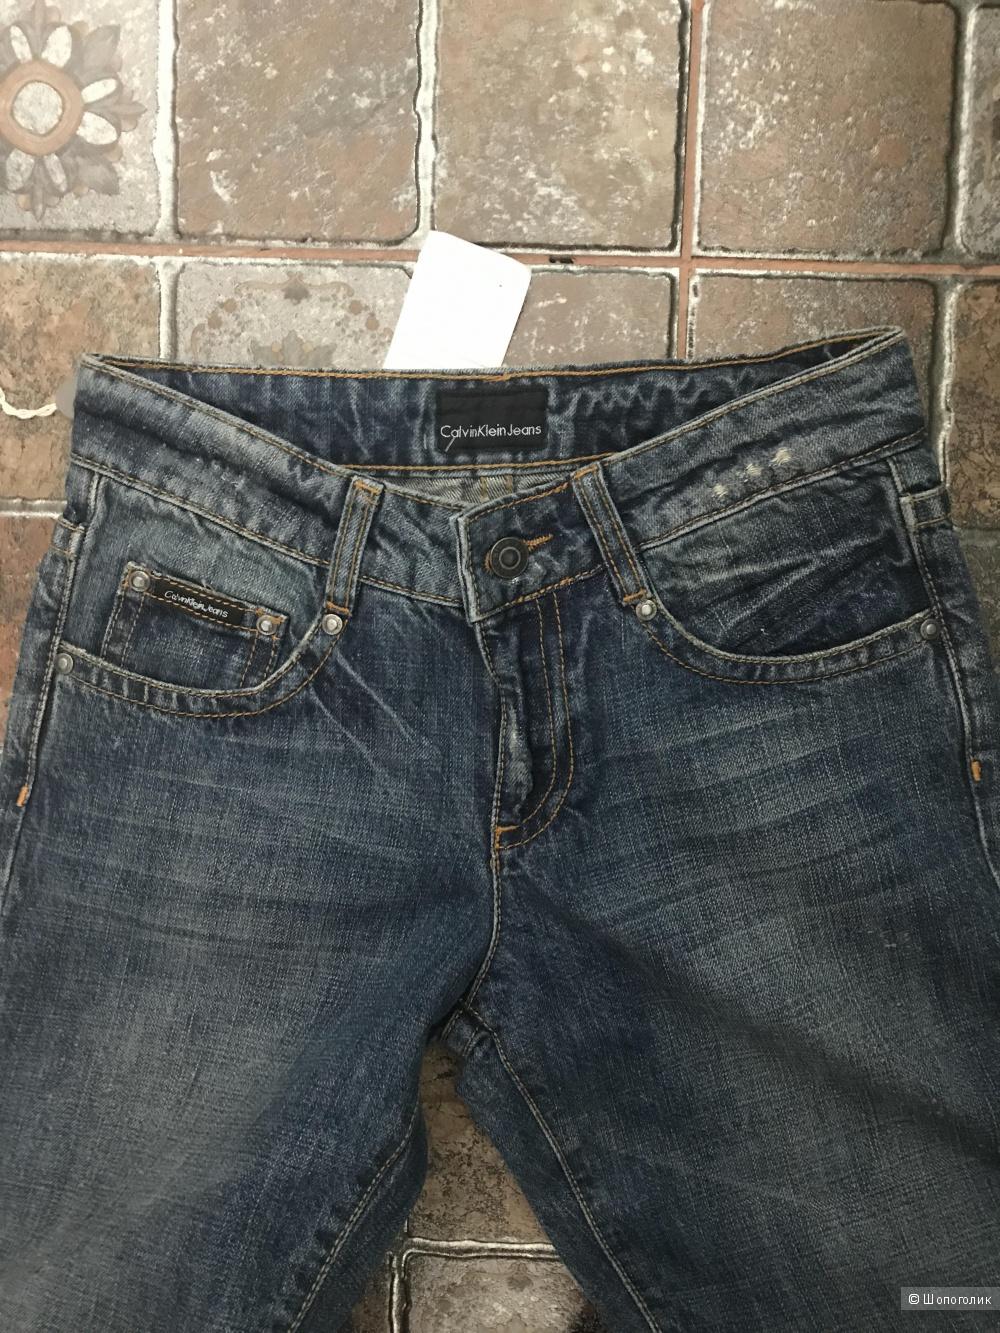 Джинсы Calvin Klein Jeans р.26 (по факту, скорее, 25)